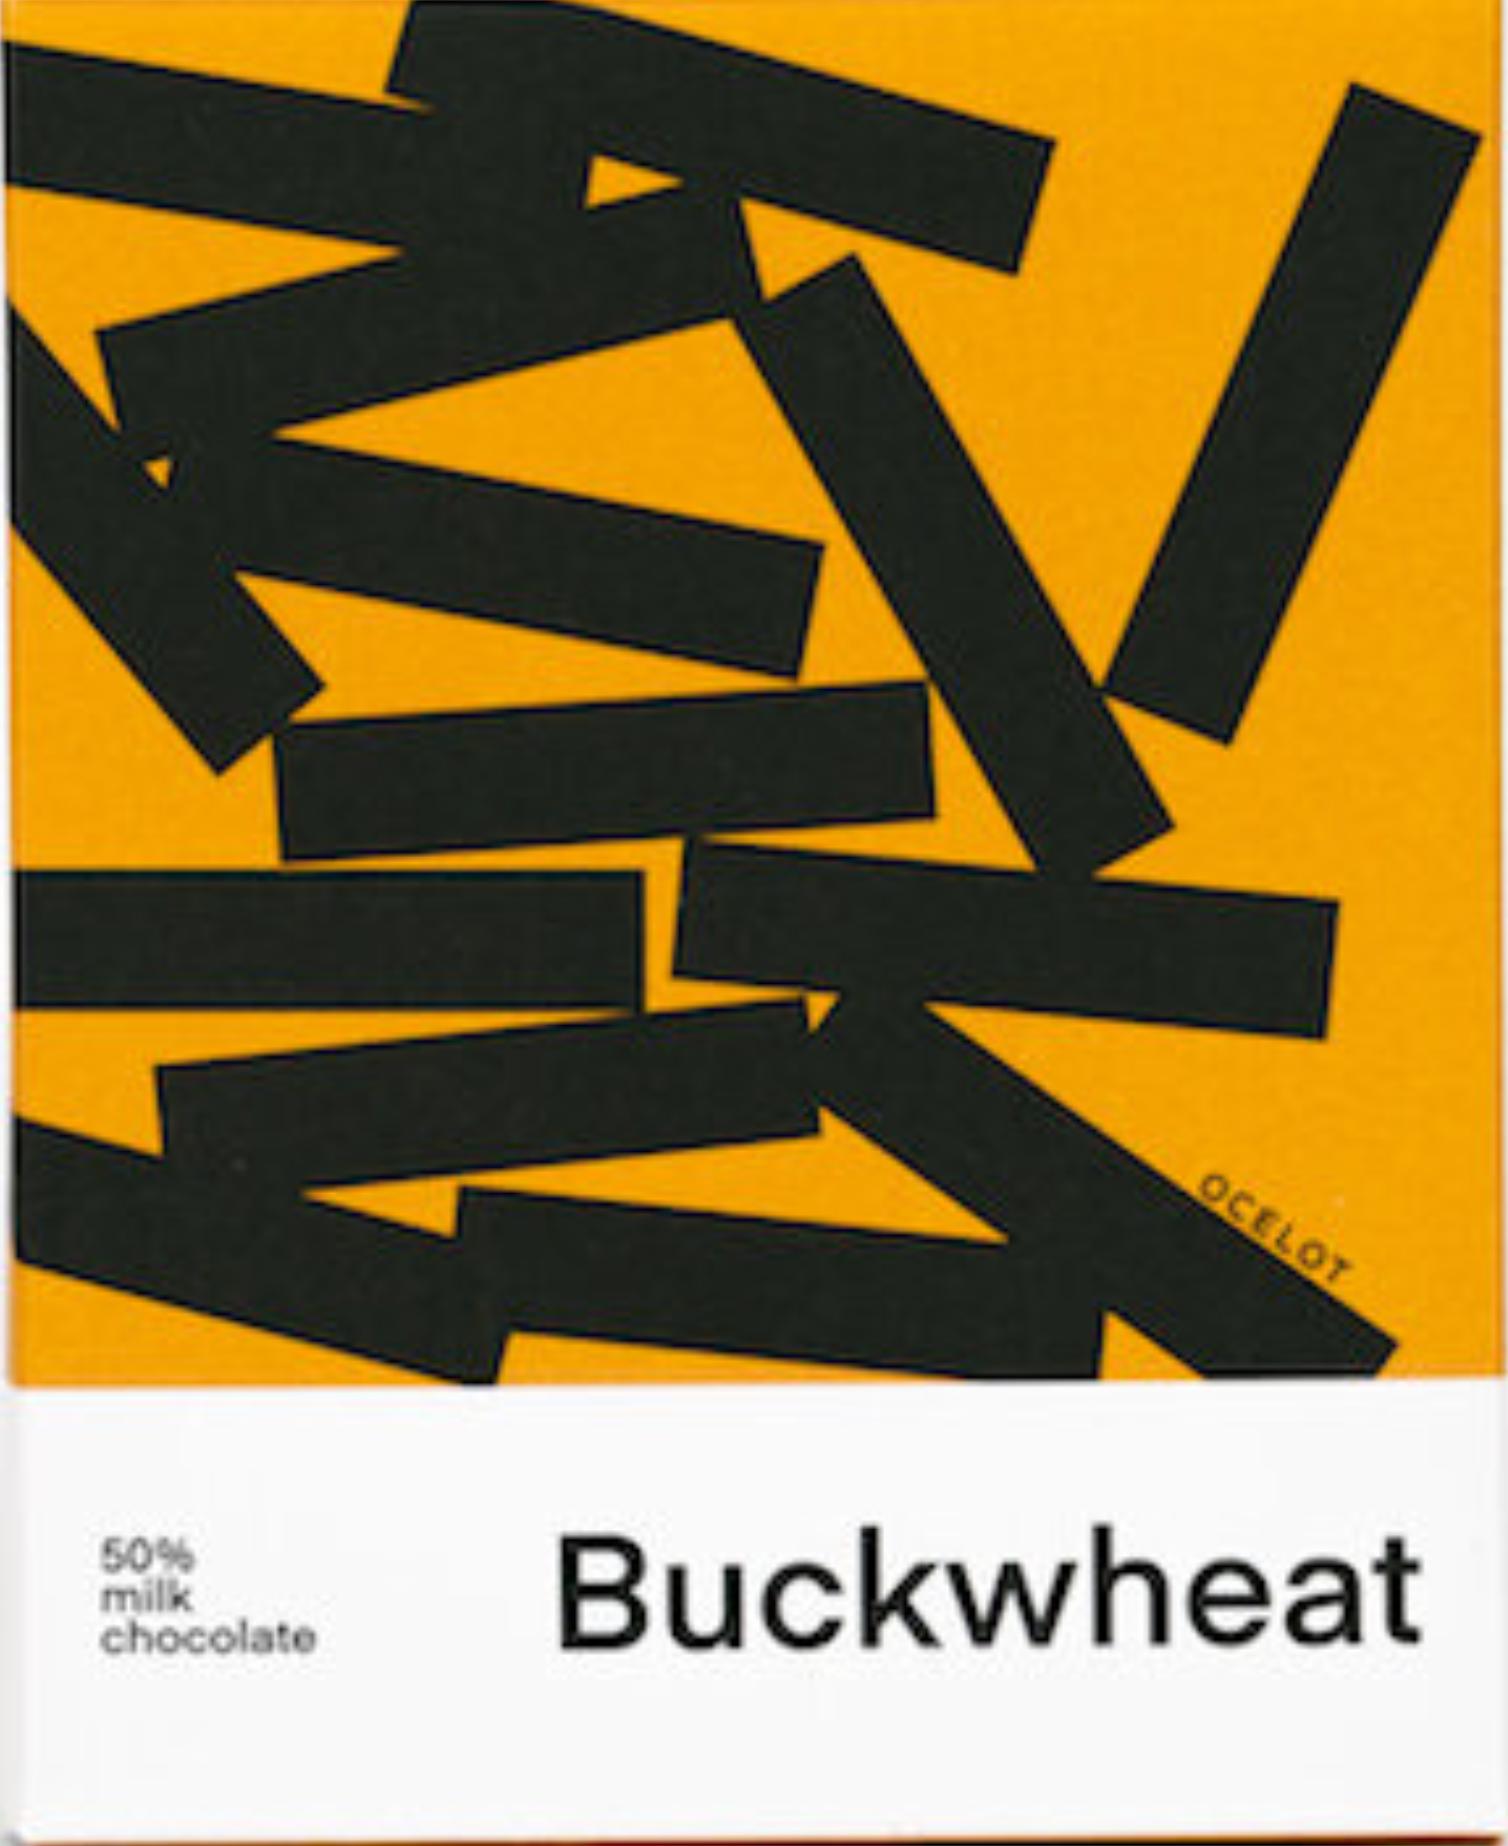 OCELOT   Milchschokolade & Buchweizen »Buckwheat« 50%   BIO   MHD 08.12.2021